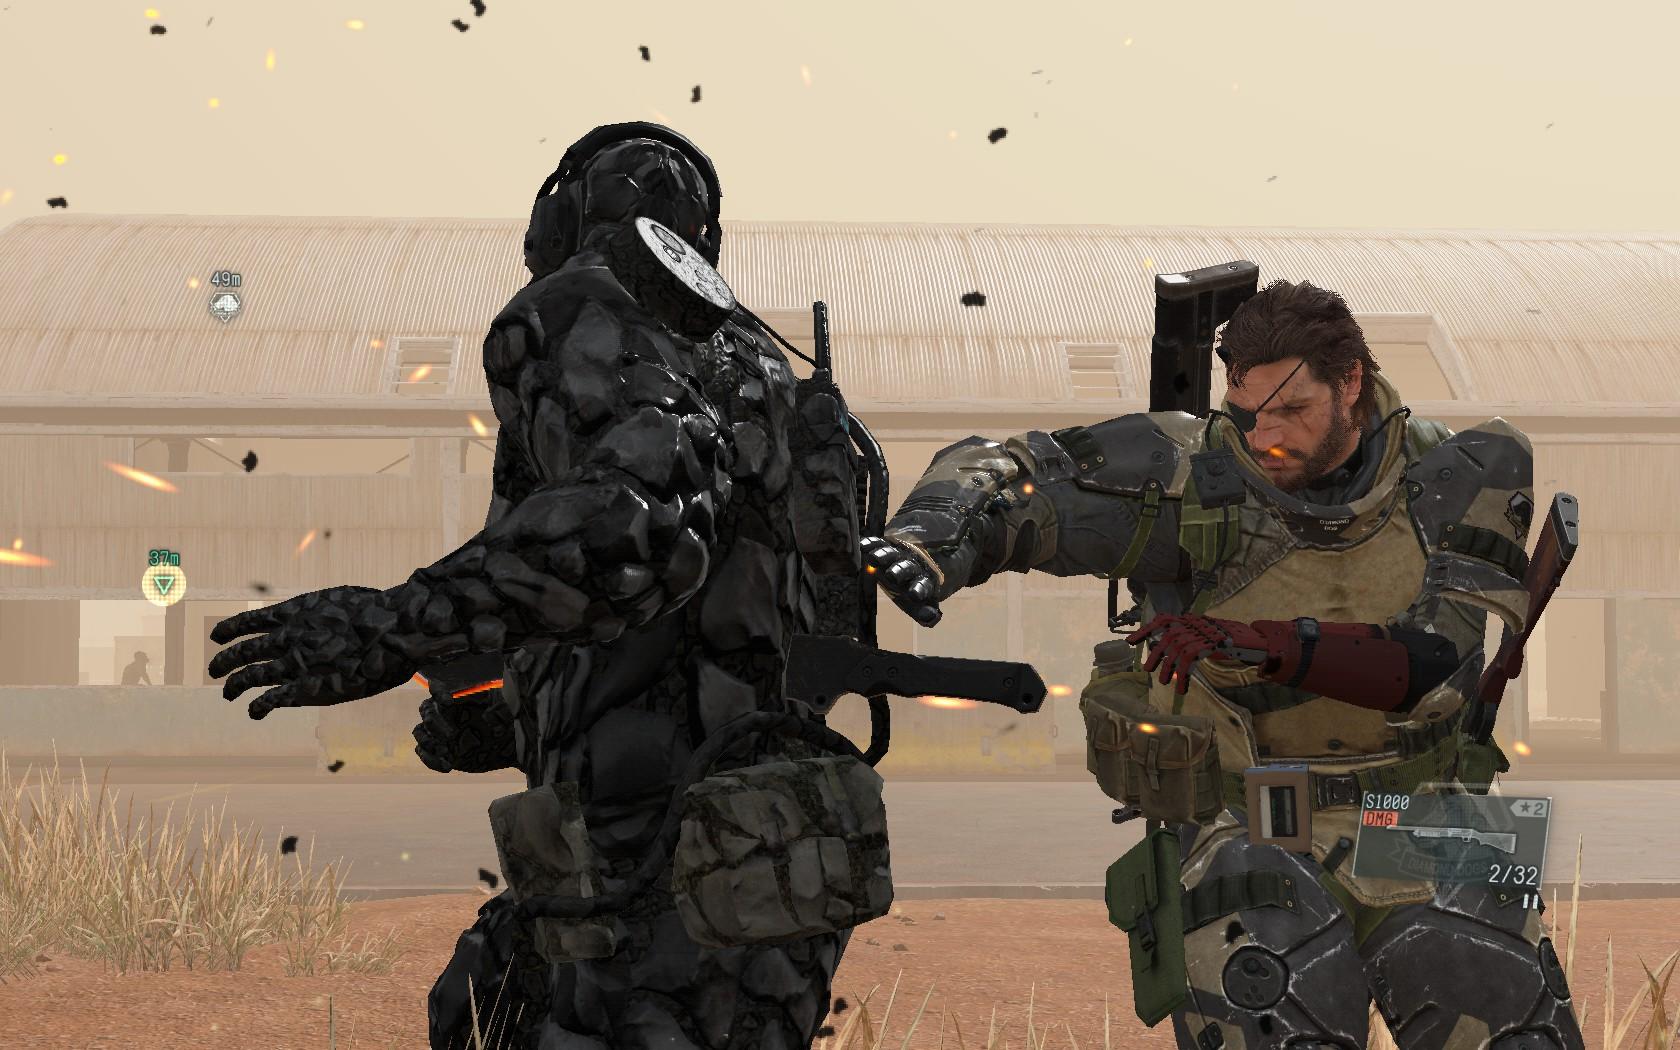 Metal Gear Solid V: The Phantom Pain 113749